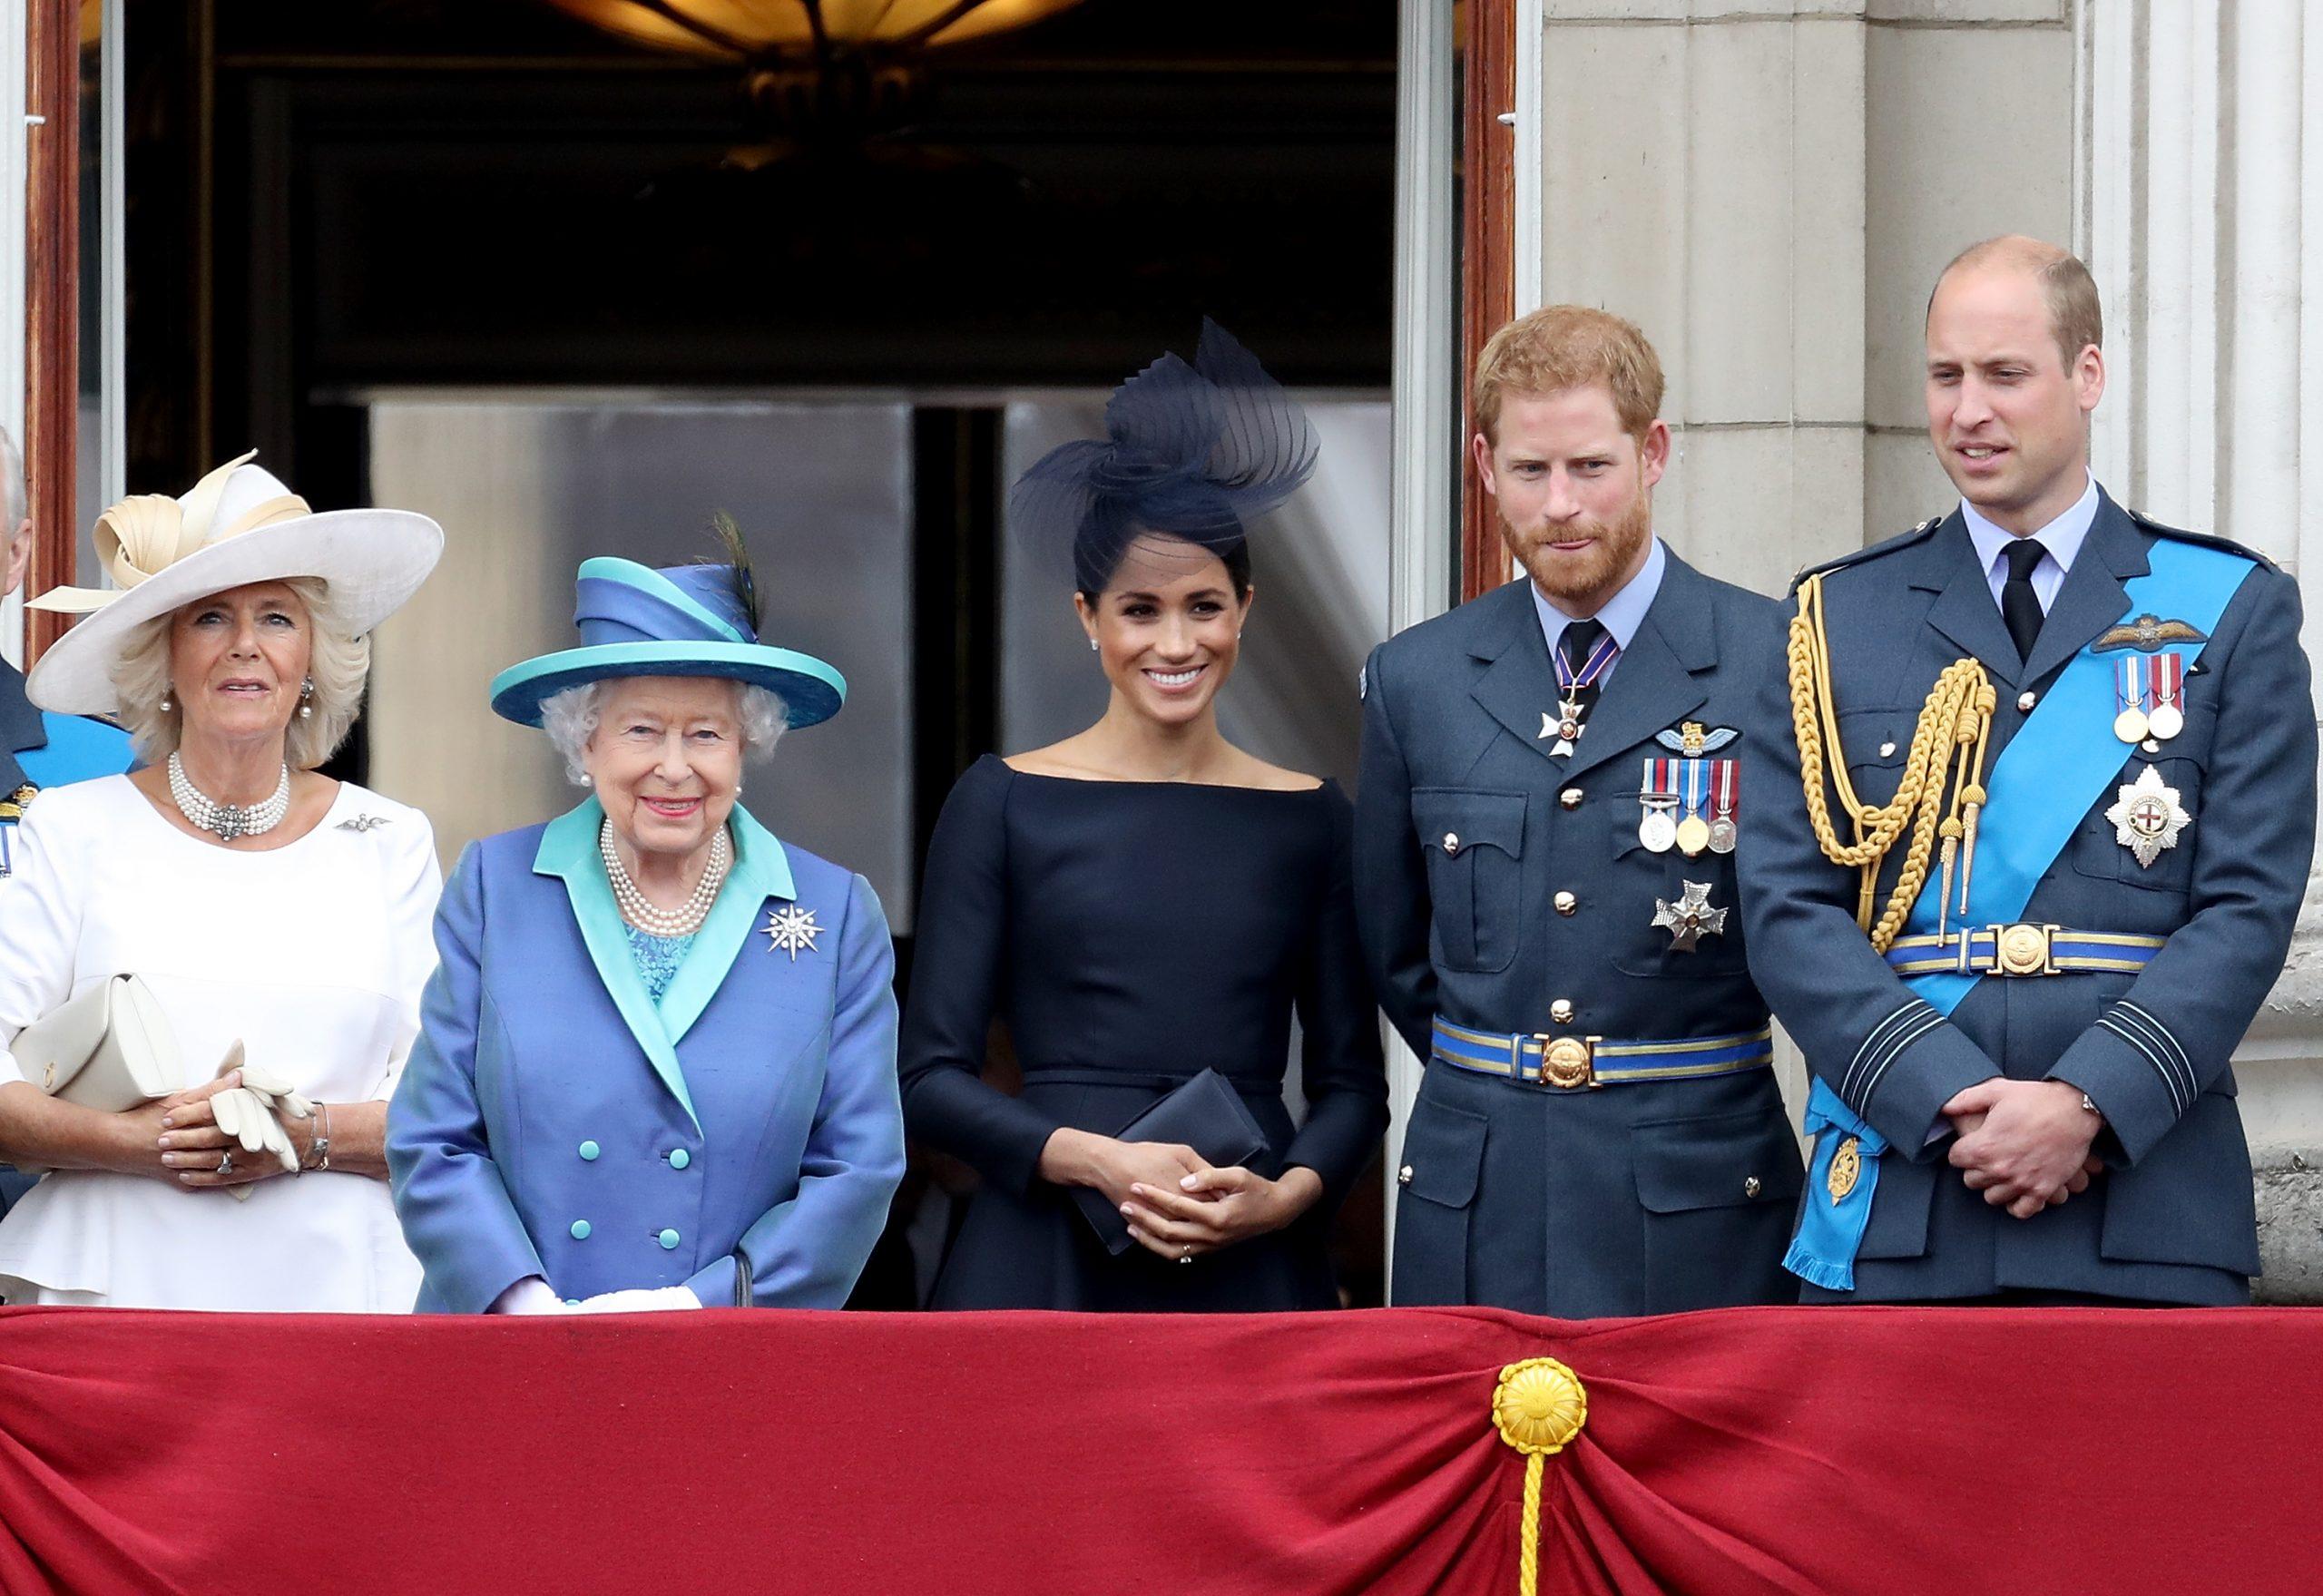 Duchesse Camilla, La Reine, Meghan Markle, Prince Harry, Prince William